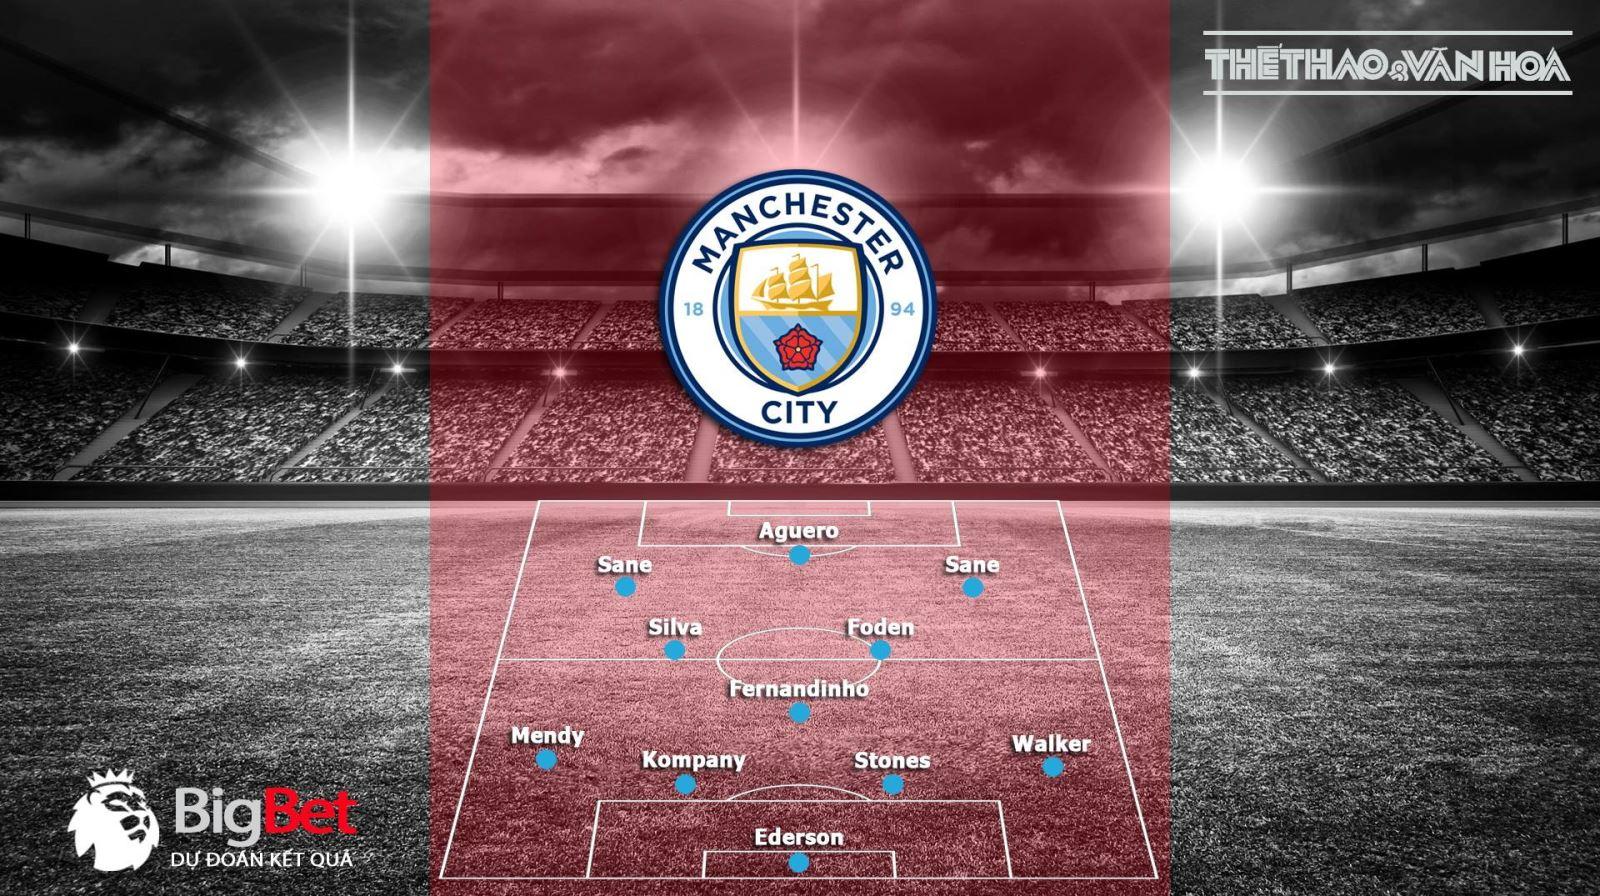 Soi kèo Liverpool vs Man City (23h30 ngày 07/10). Nhận định trận Liverpool vs Man City.